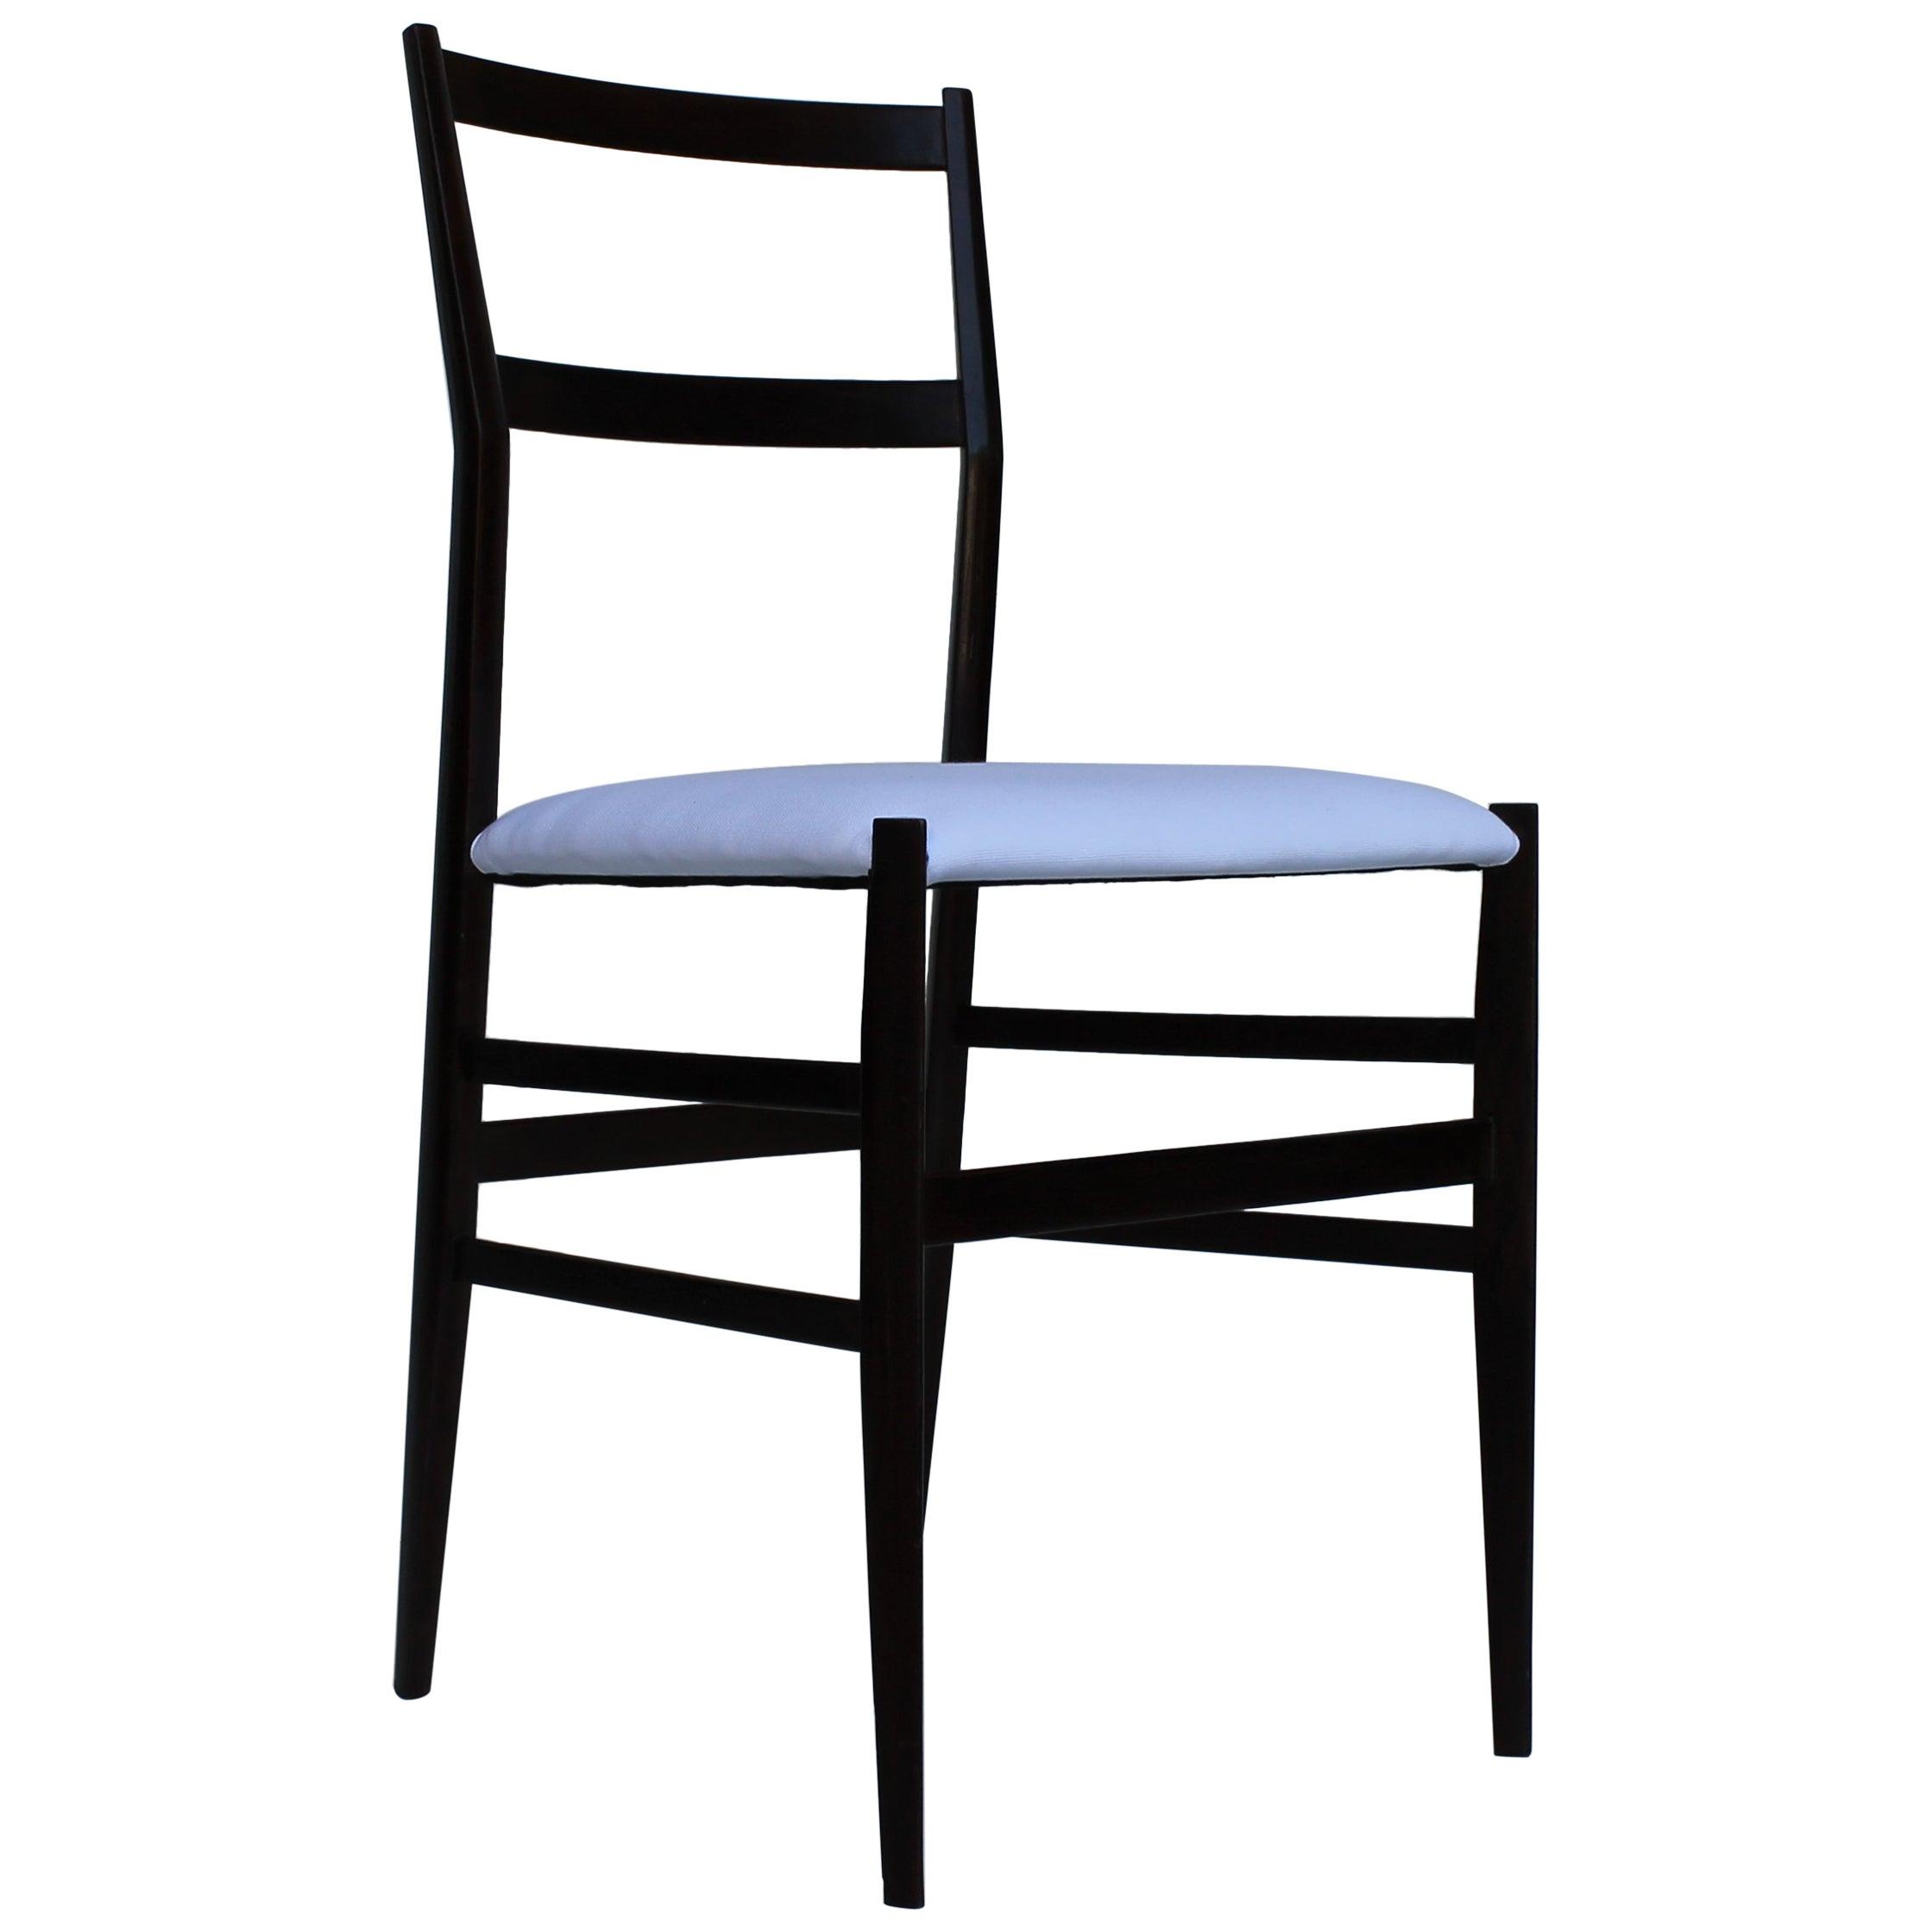 Midcentury Giò Ponti Mahogany Ashwood 699 Leggera Italian Chair for Cassina 1957